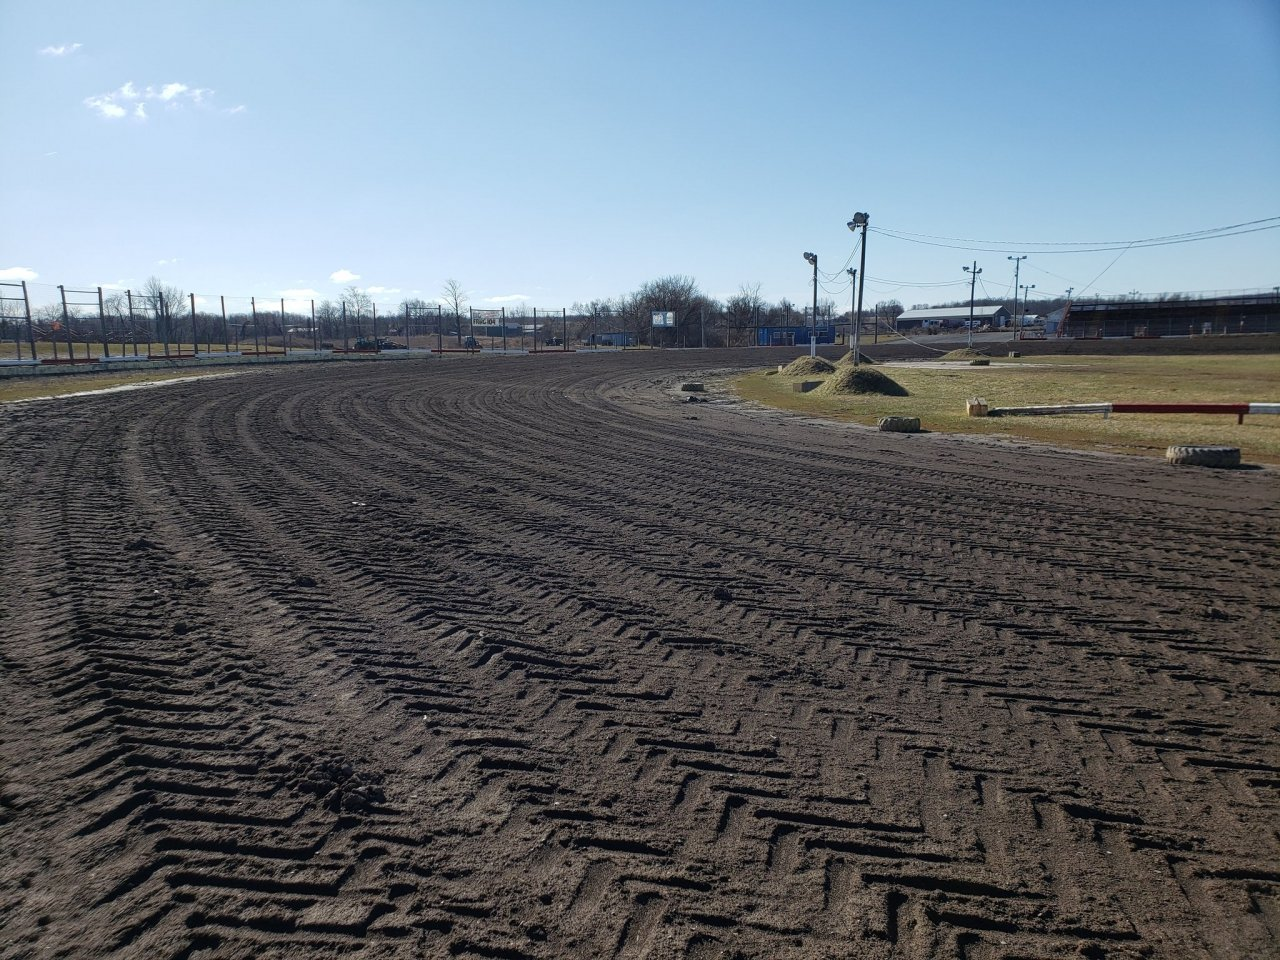 Utica Rome Speedway - New York Dirt Track